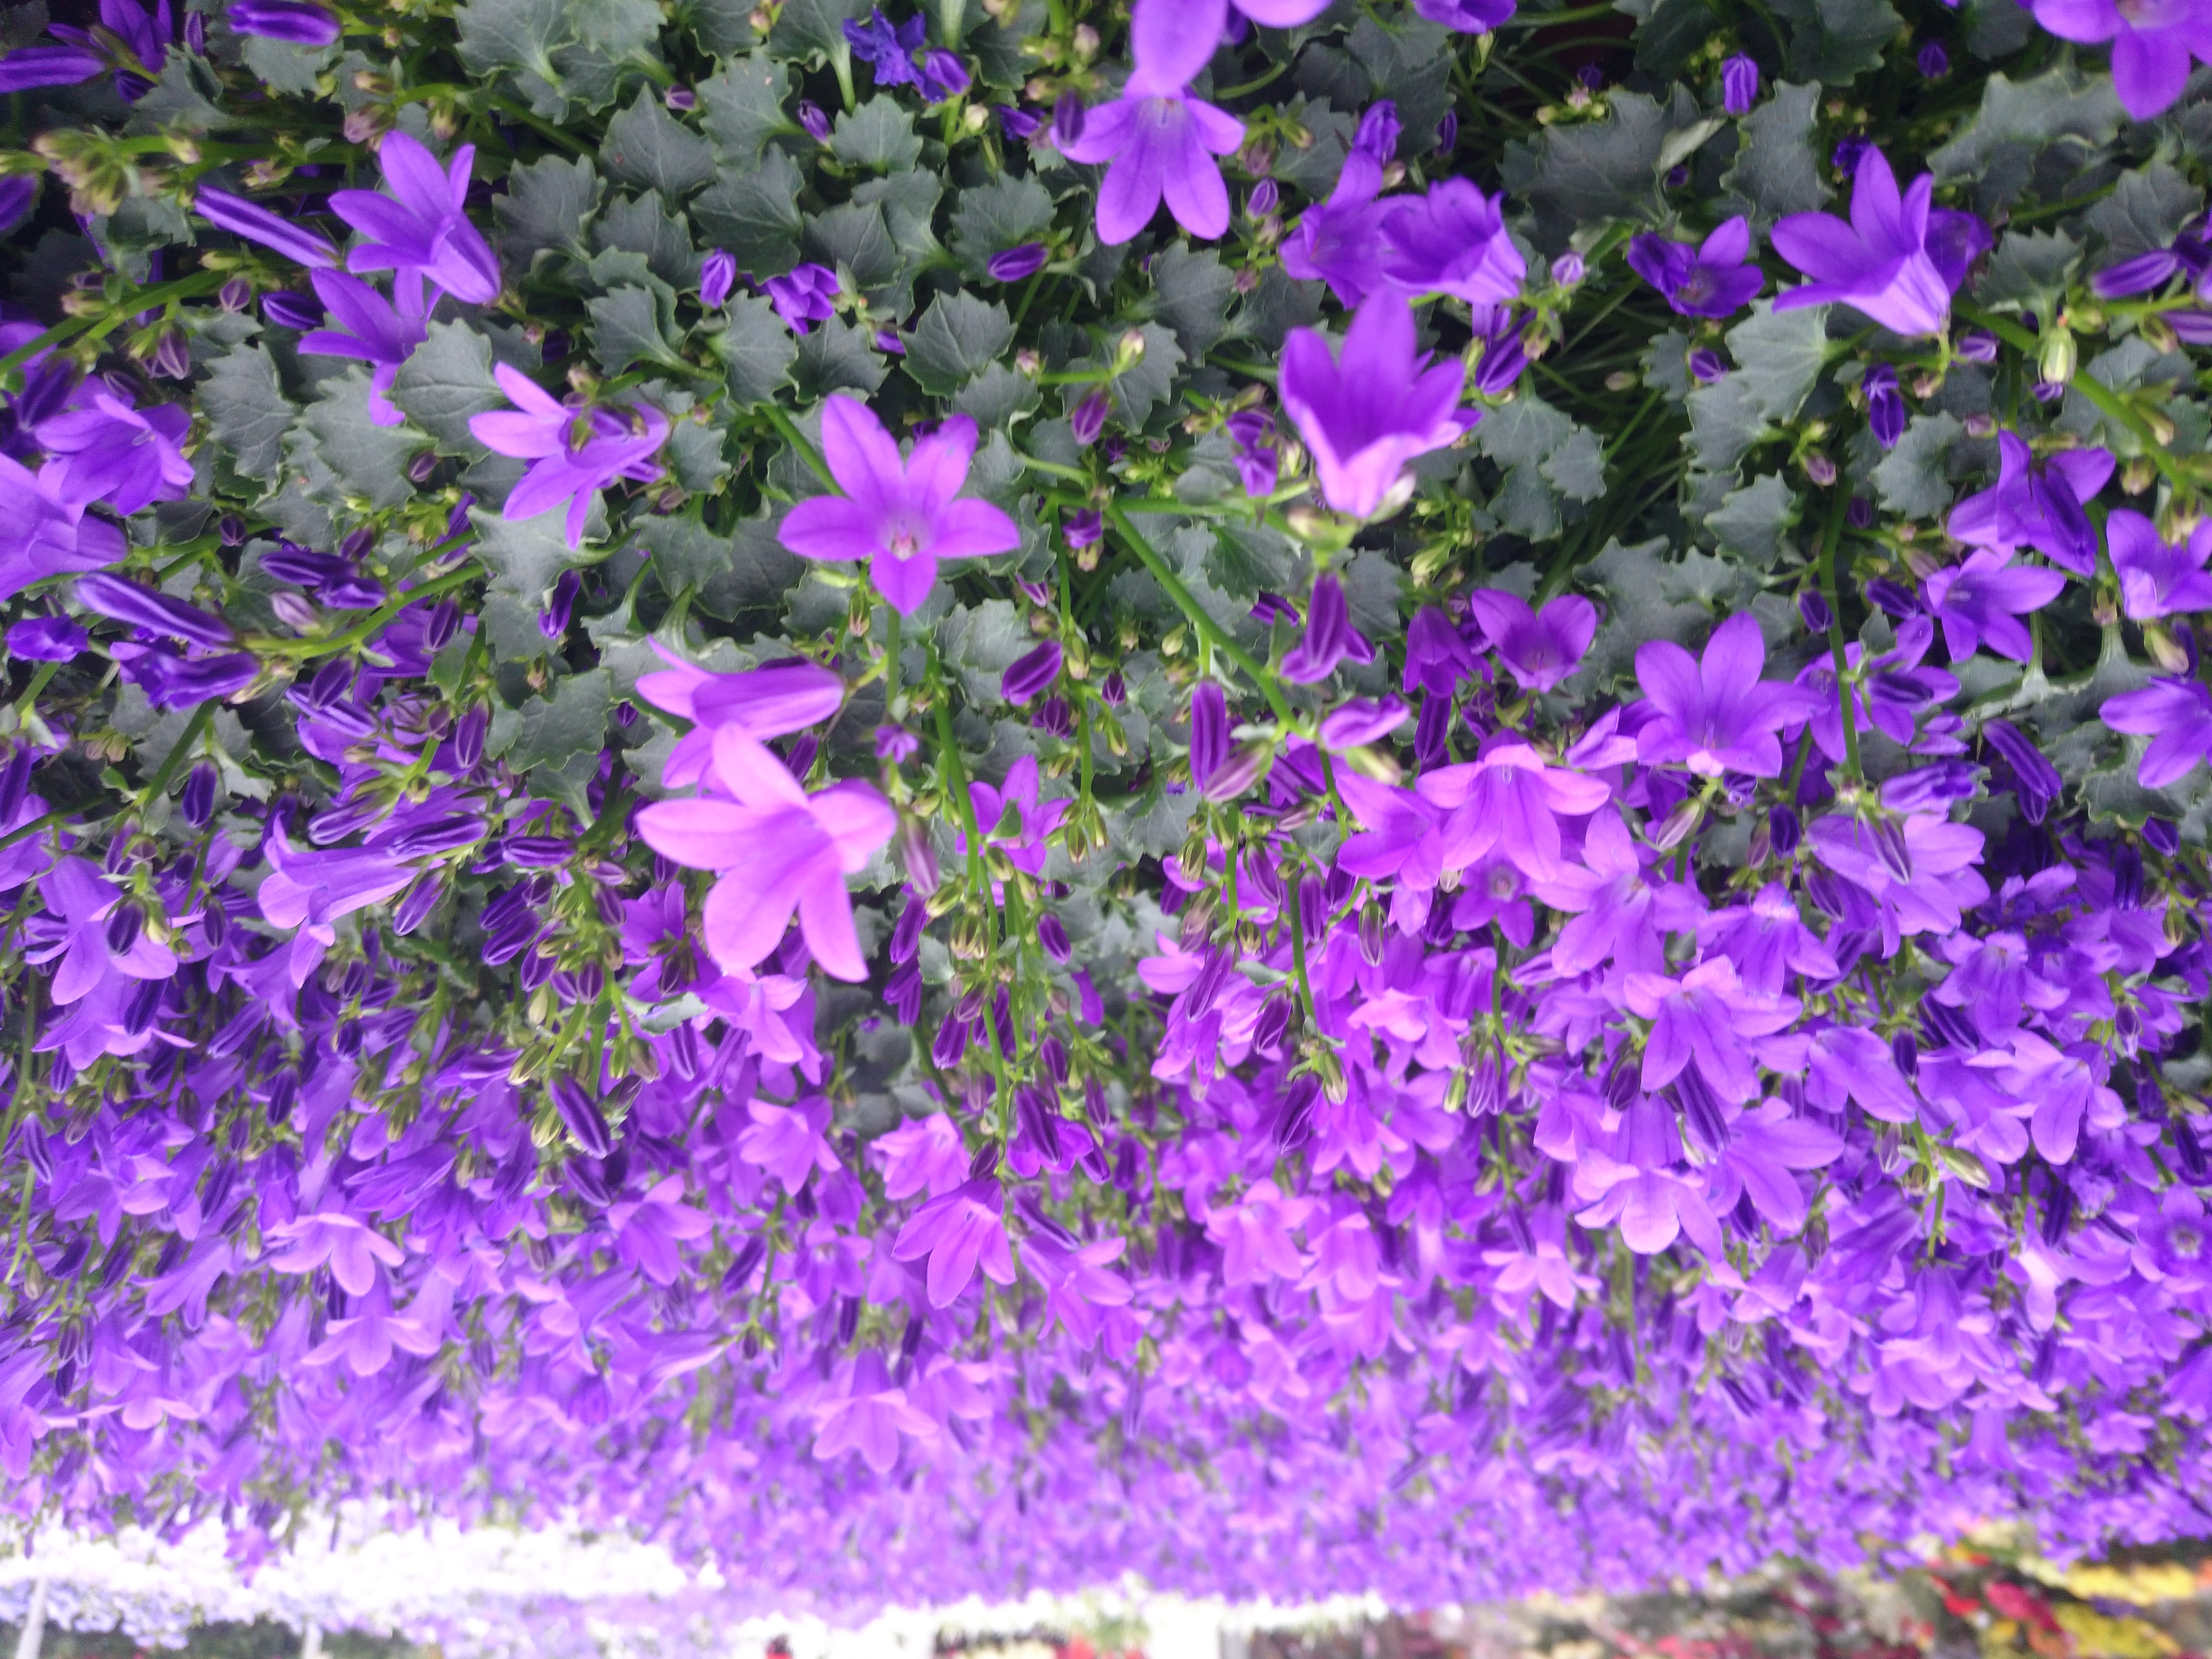 File:Champs de fleur violette.jpg - Wikimedia Commons